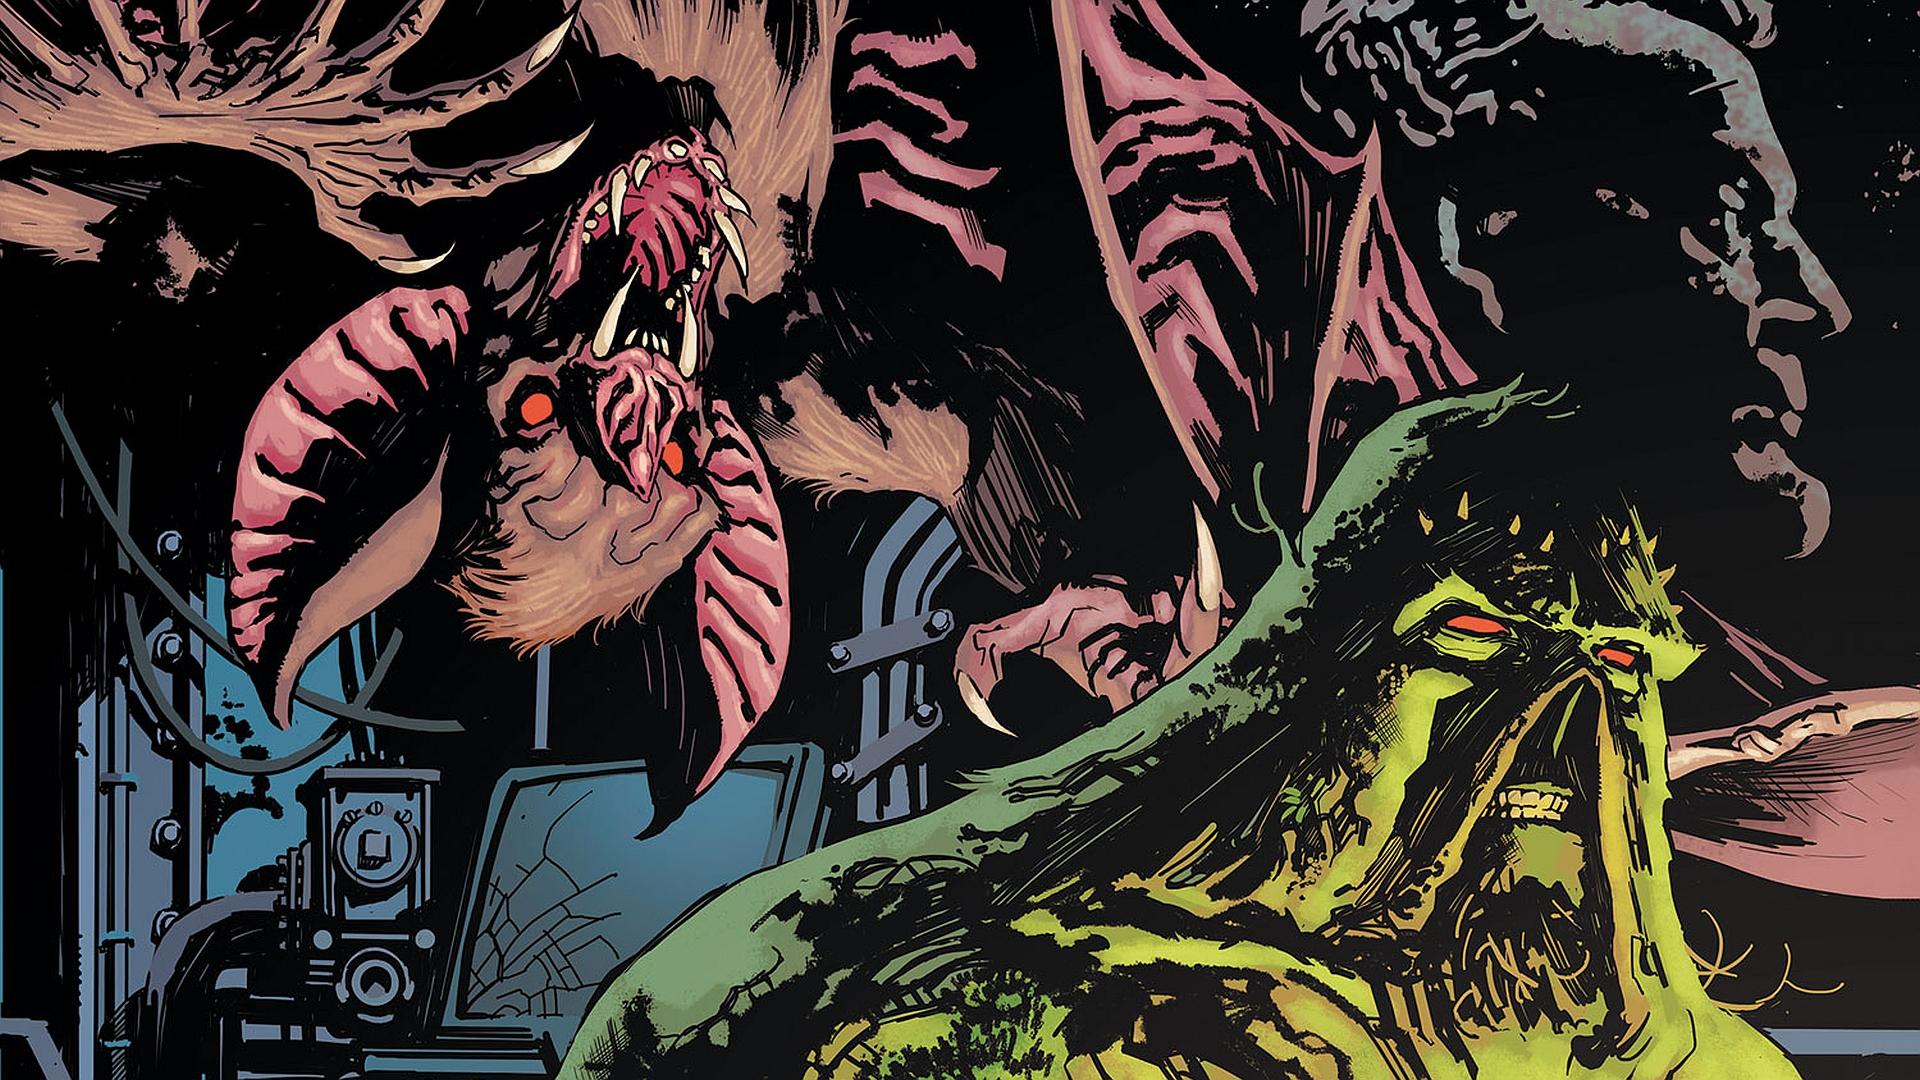 539391 Title Comics Swamp Thing Wallpaper Swamp Thing And Bat 1920x1080 Download Hd Wallpaper Wallpapertip